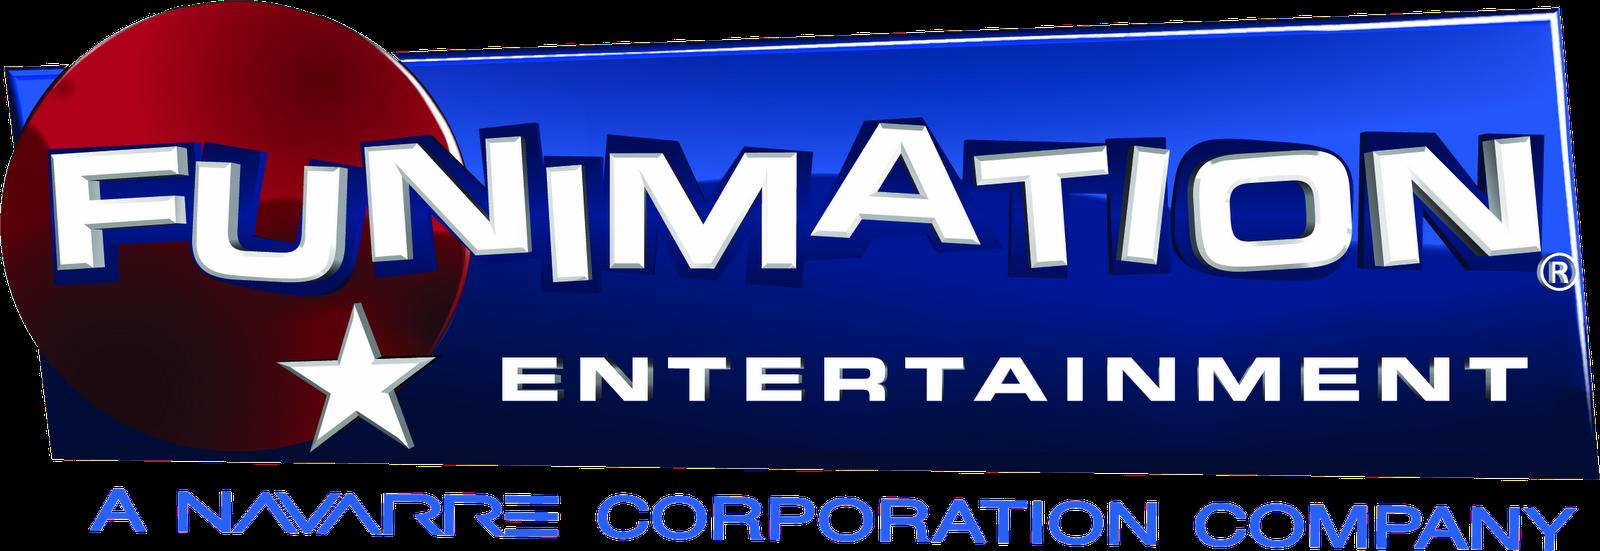 Funimation_Entertainment_Navva